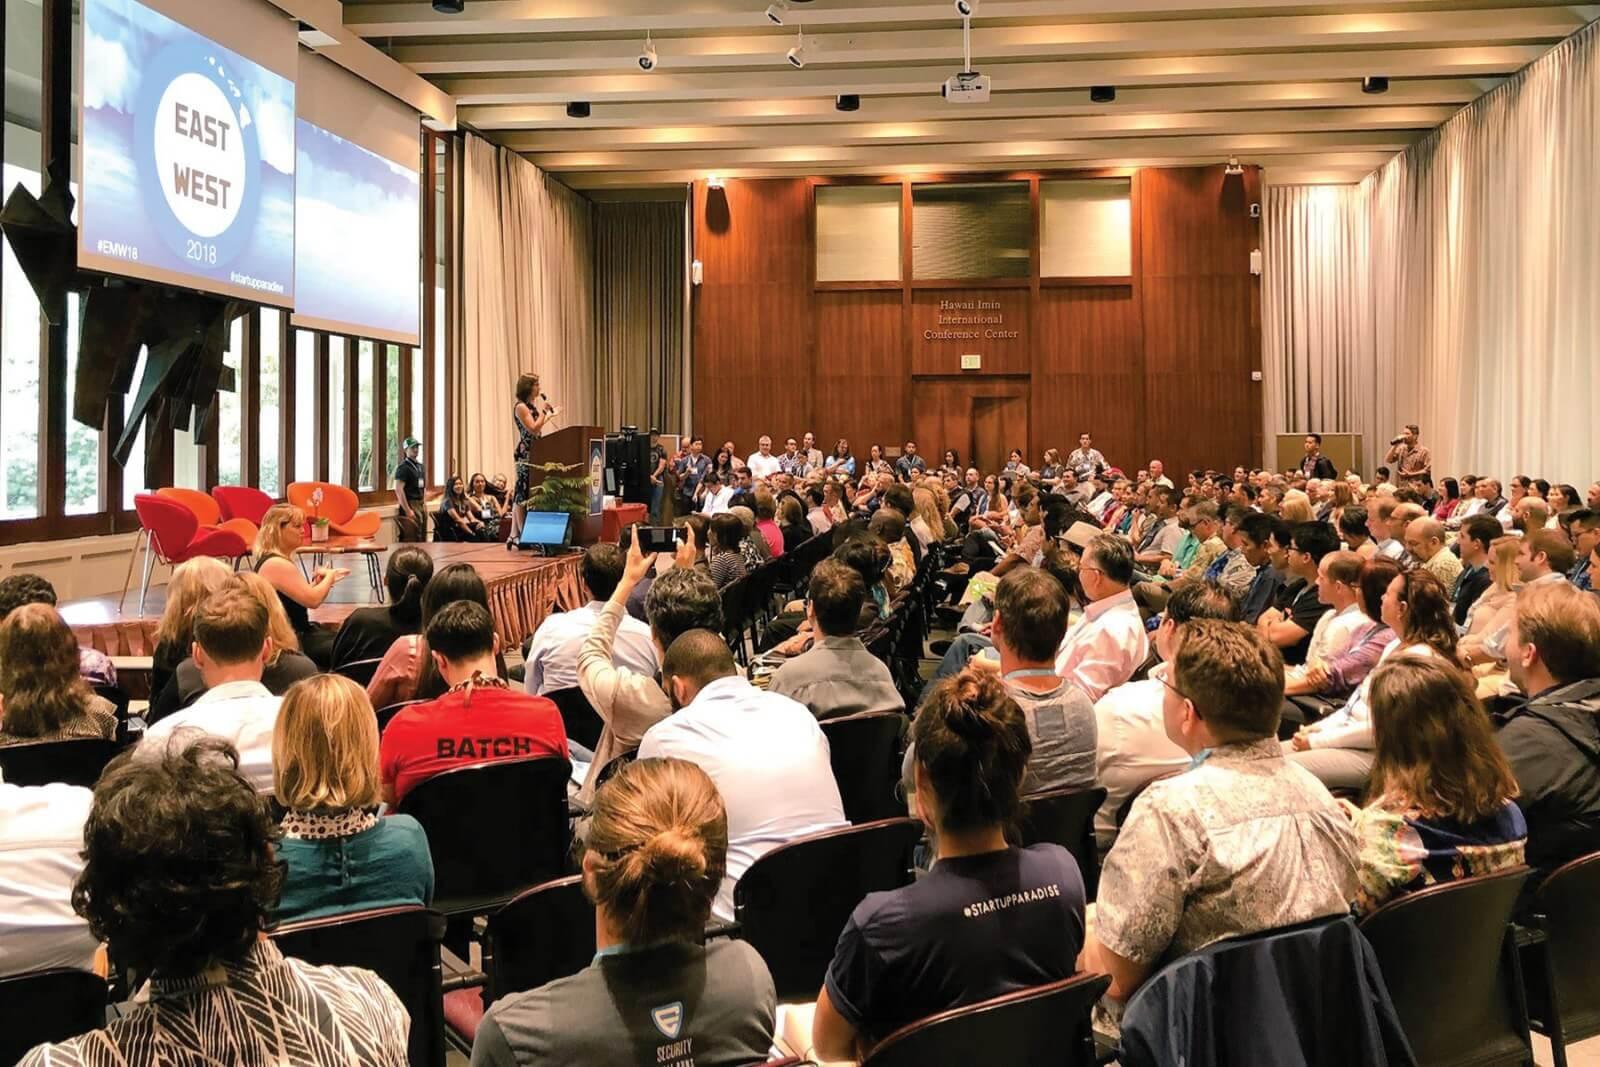 Entrepreneurs & Investors Convene at Annual East Meets West Conference